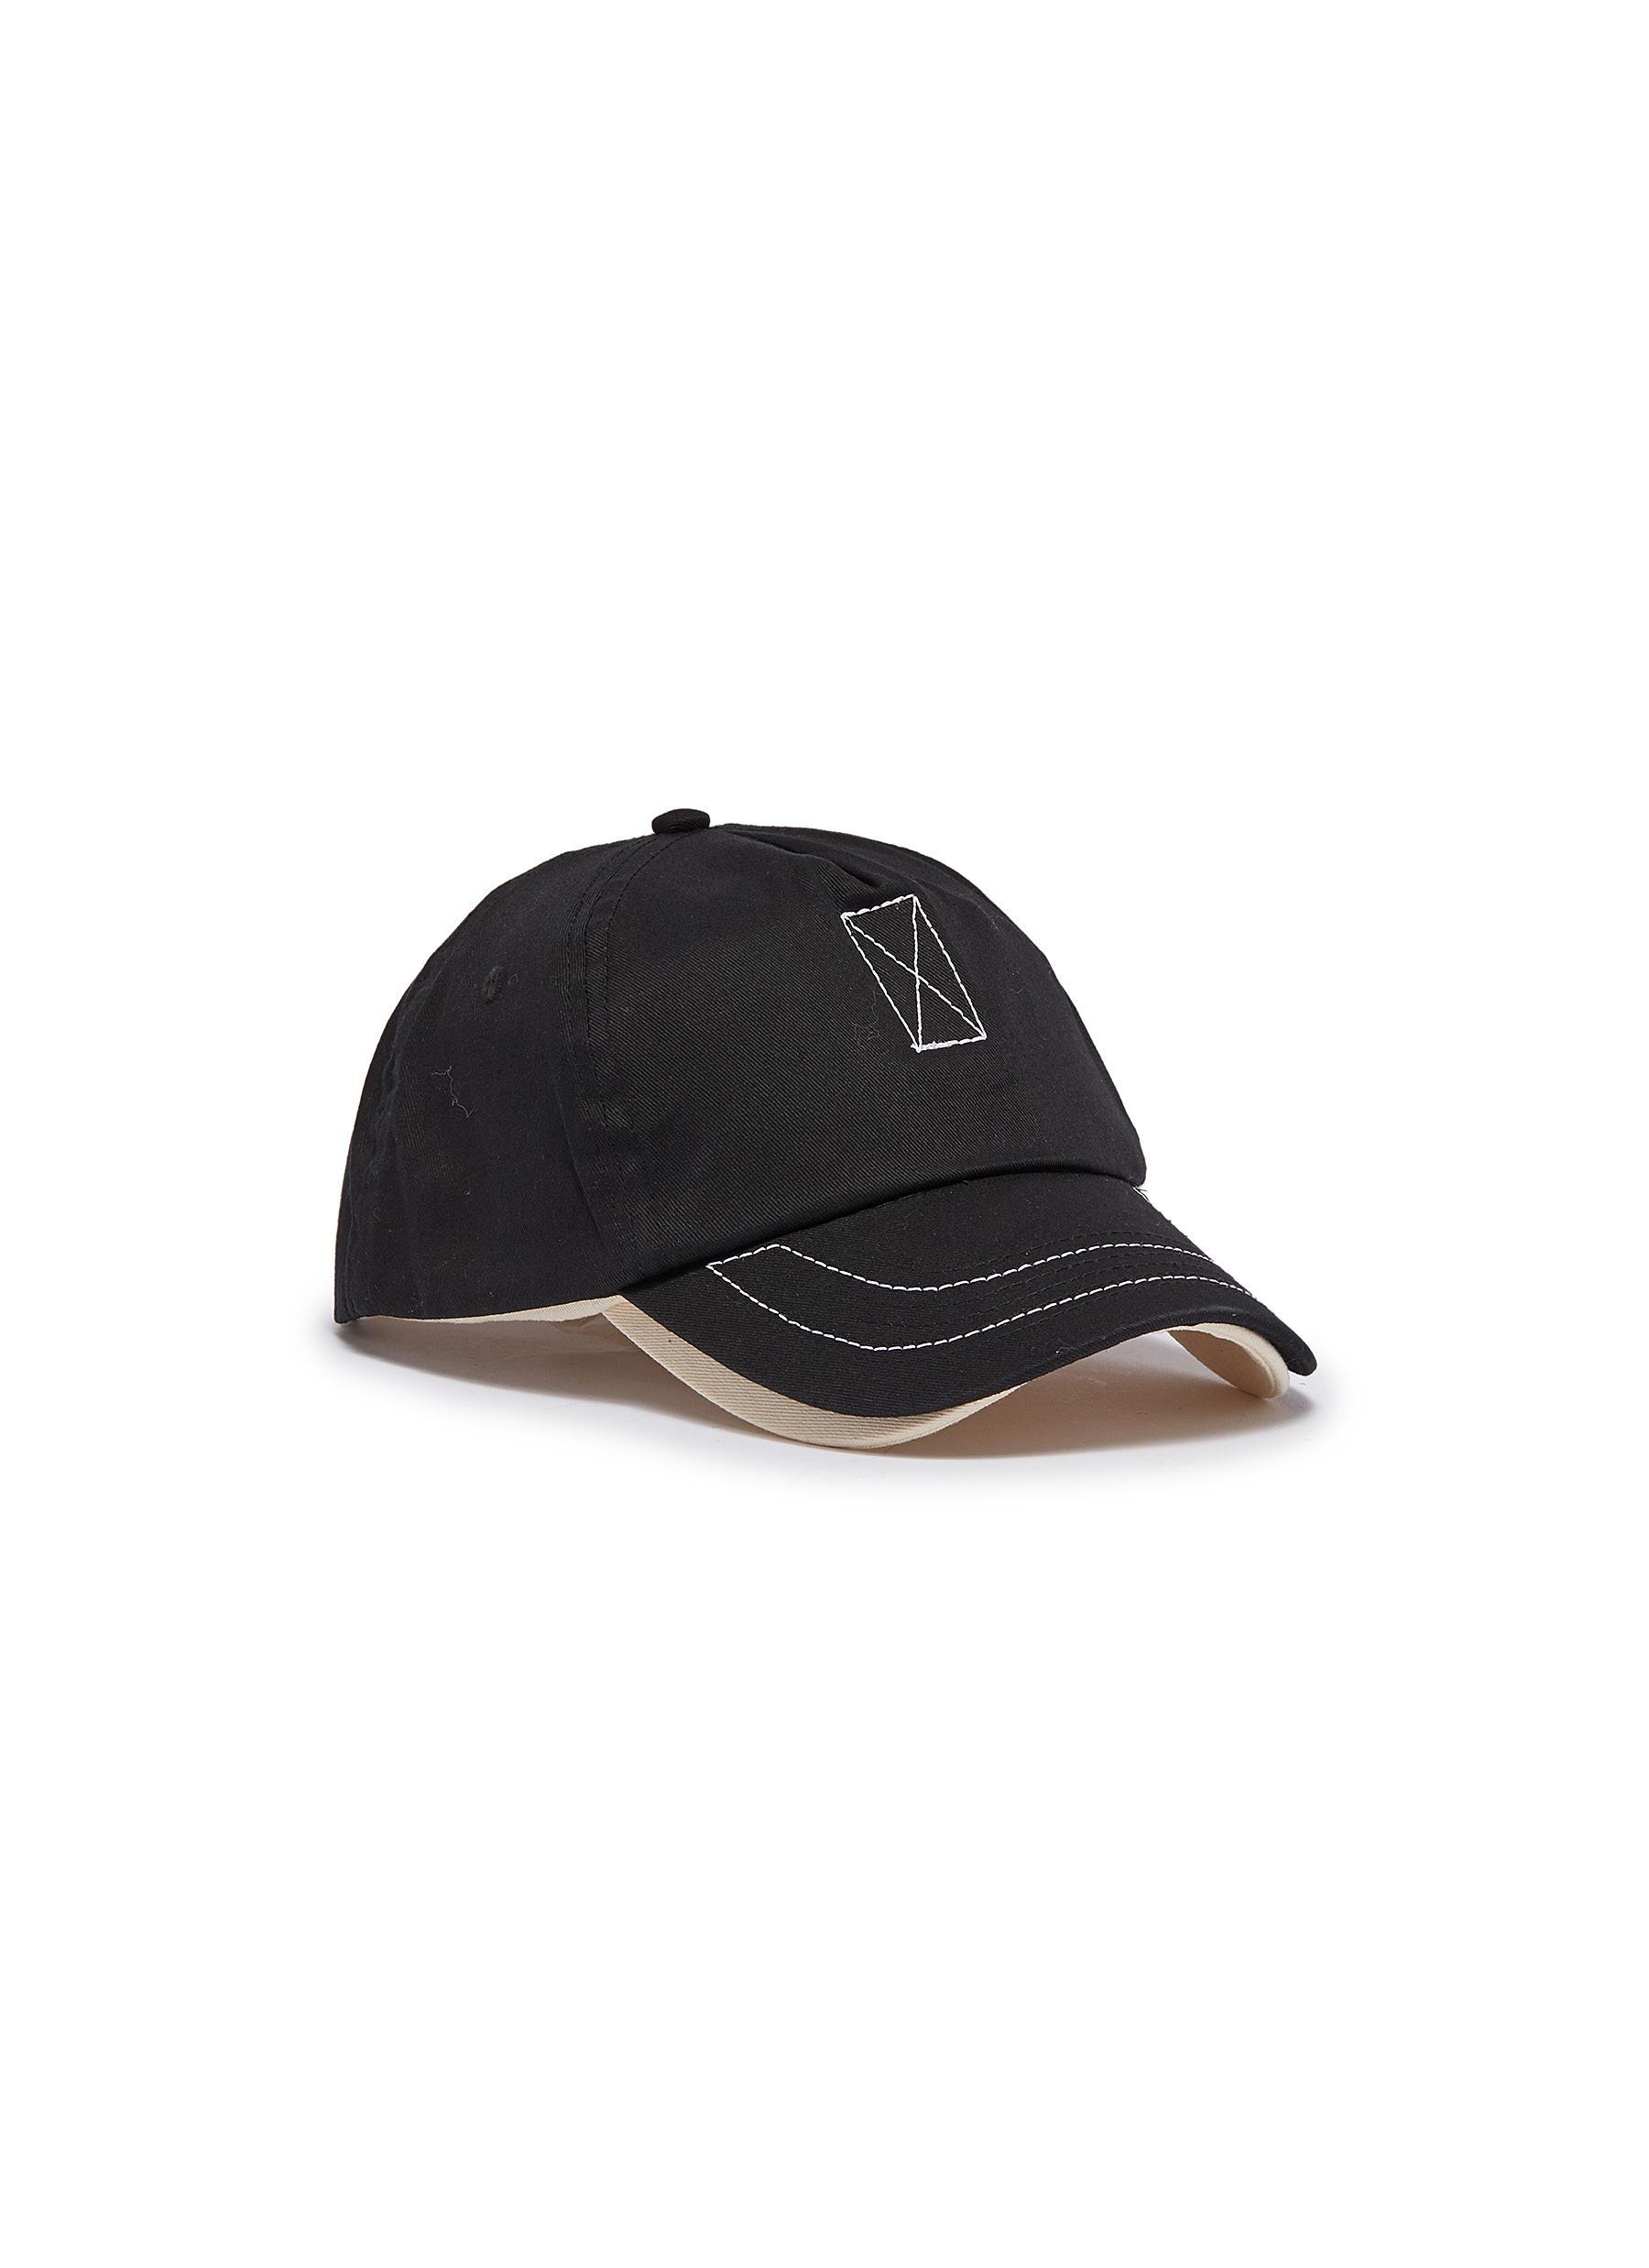 fa56d02afd2 Lyst - Bernstock Speirs Detachable Visor Layered Baseball Cap in Black